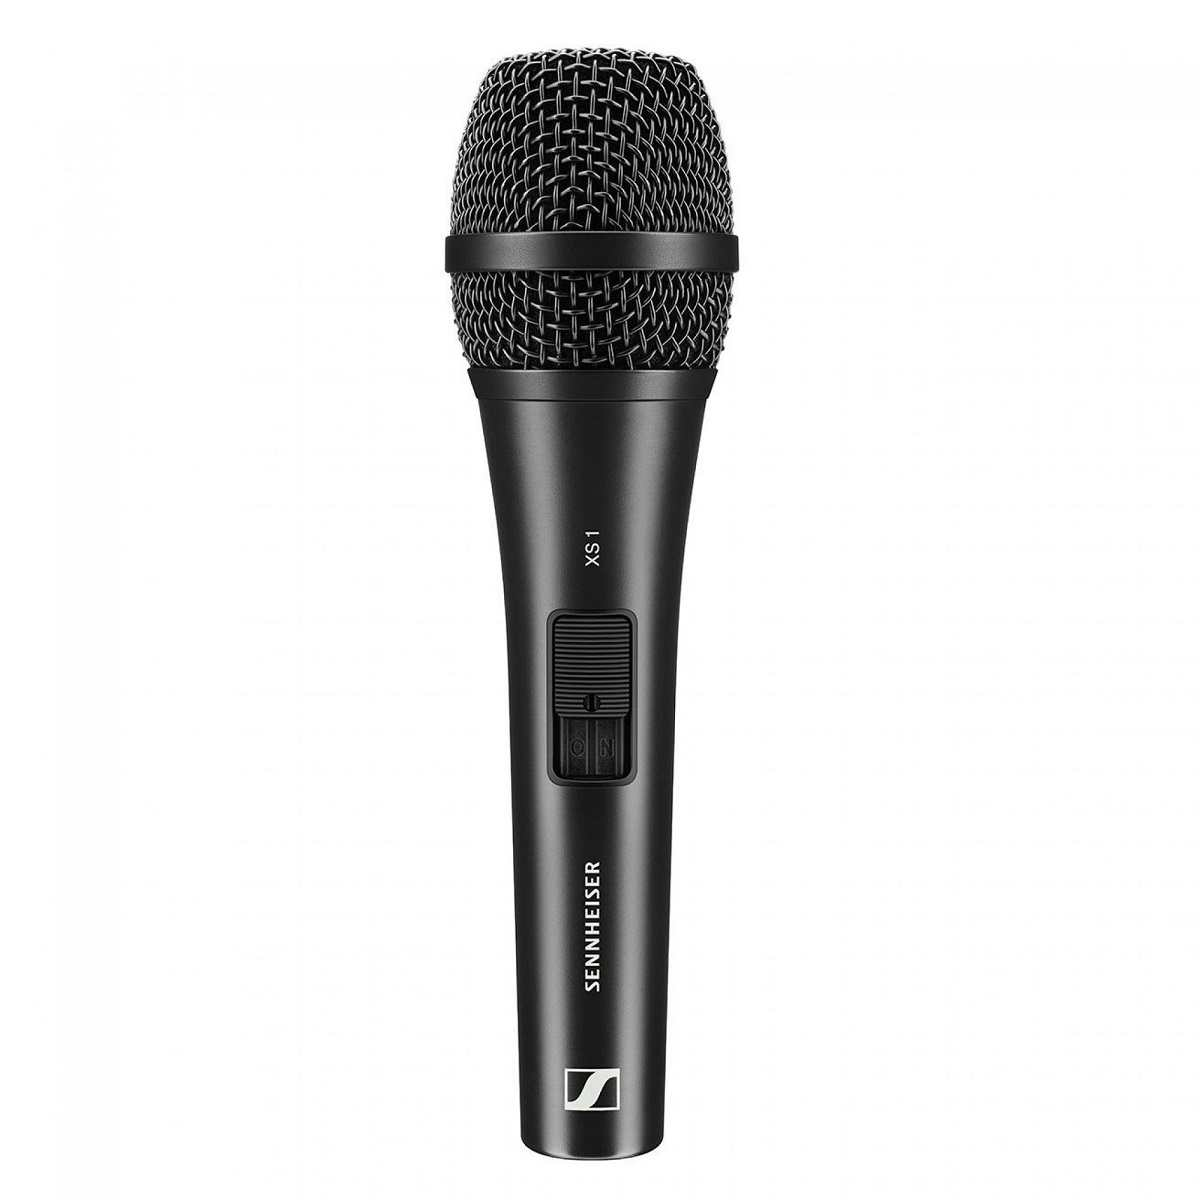 Microfone Cardióide XS1 Sennheiser Profissional